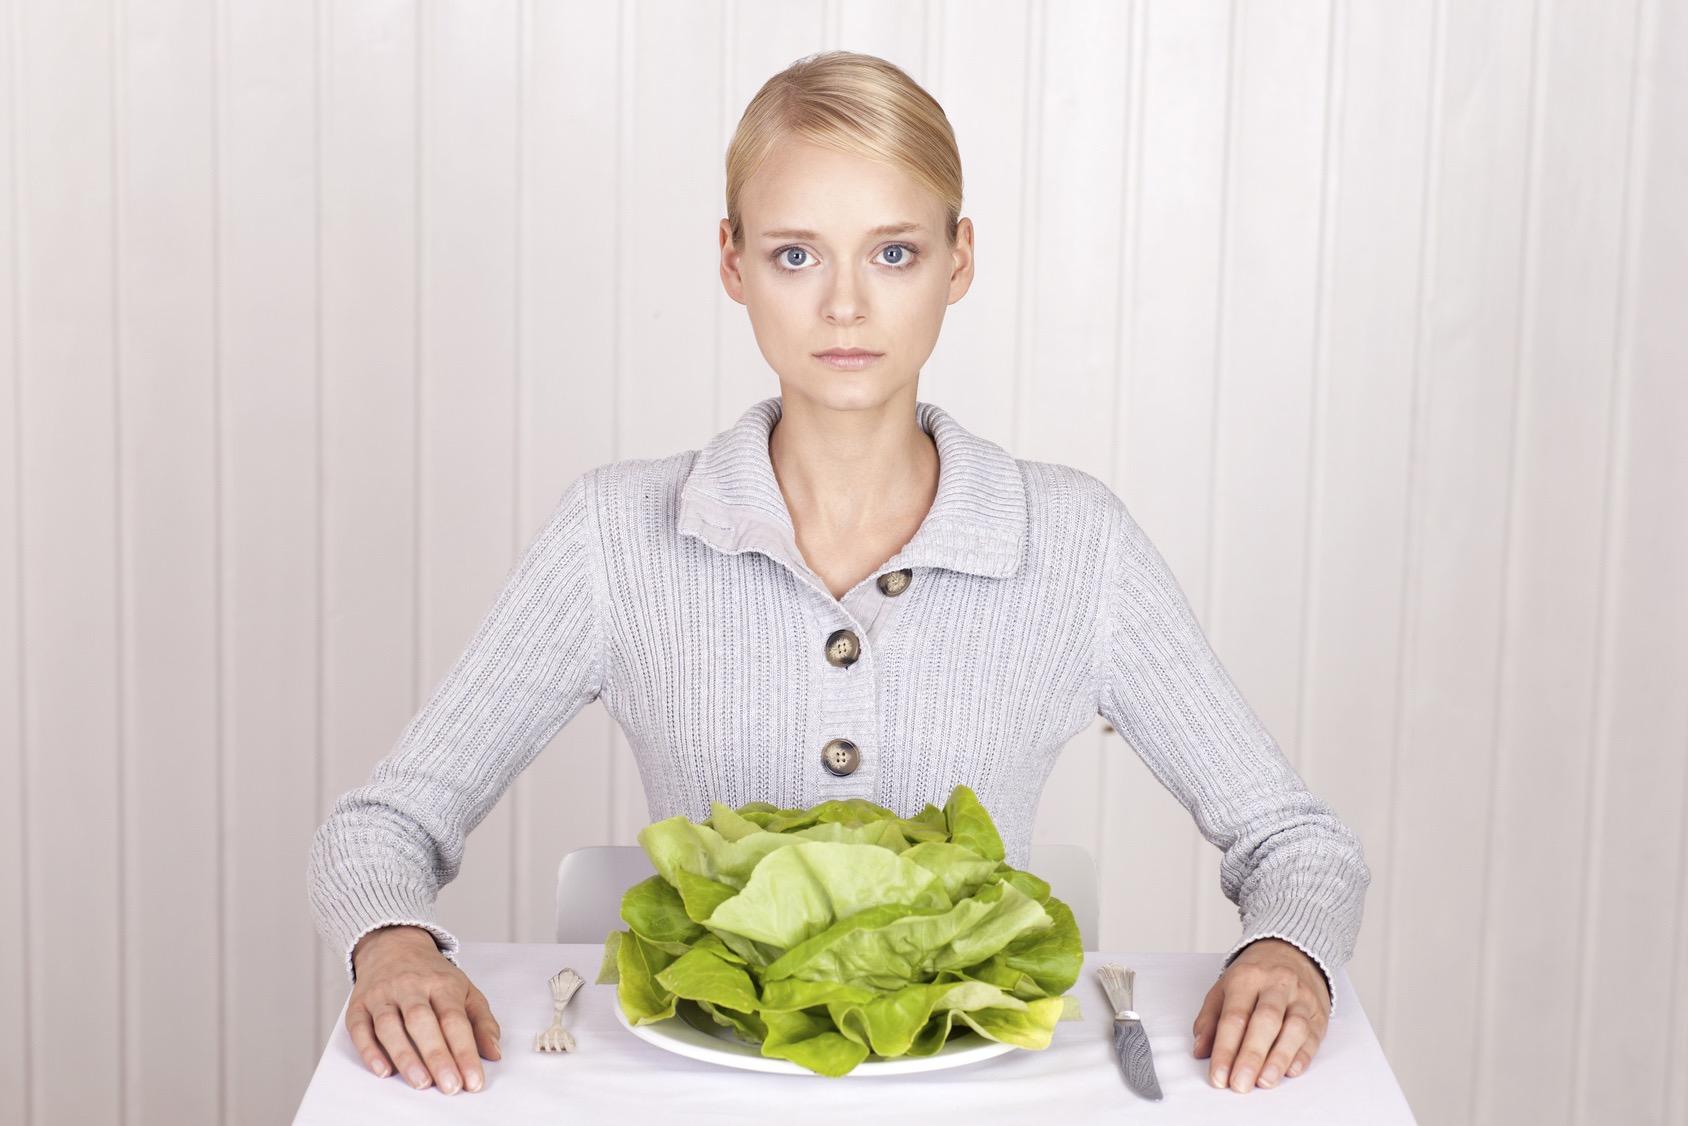 Magersüchtige Frau, Teller mit Salat